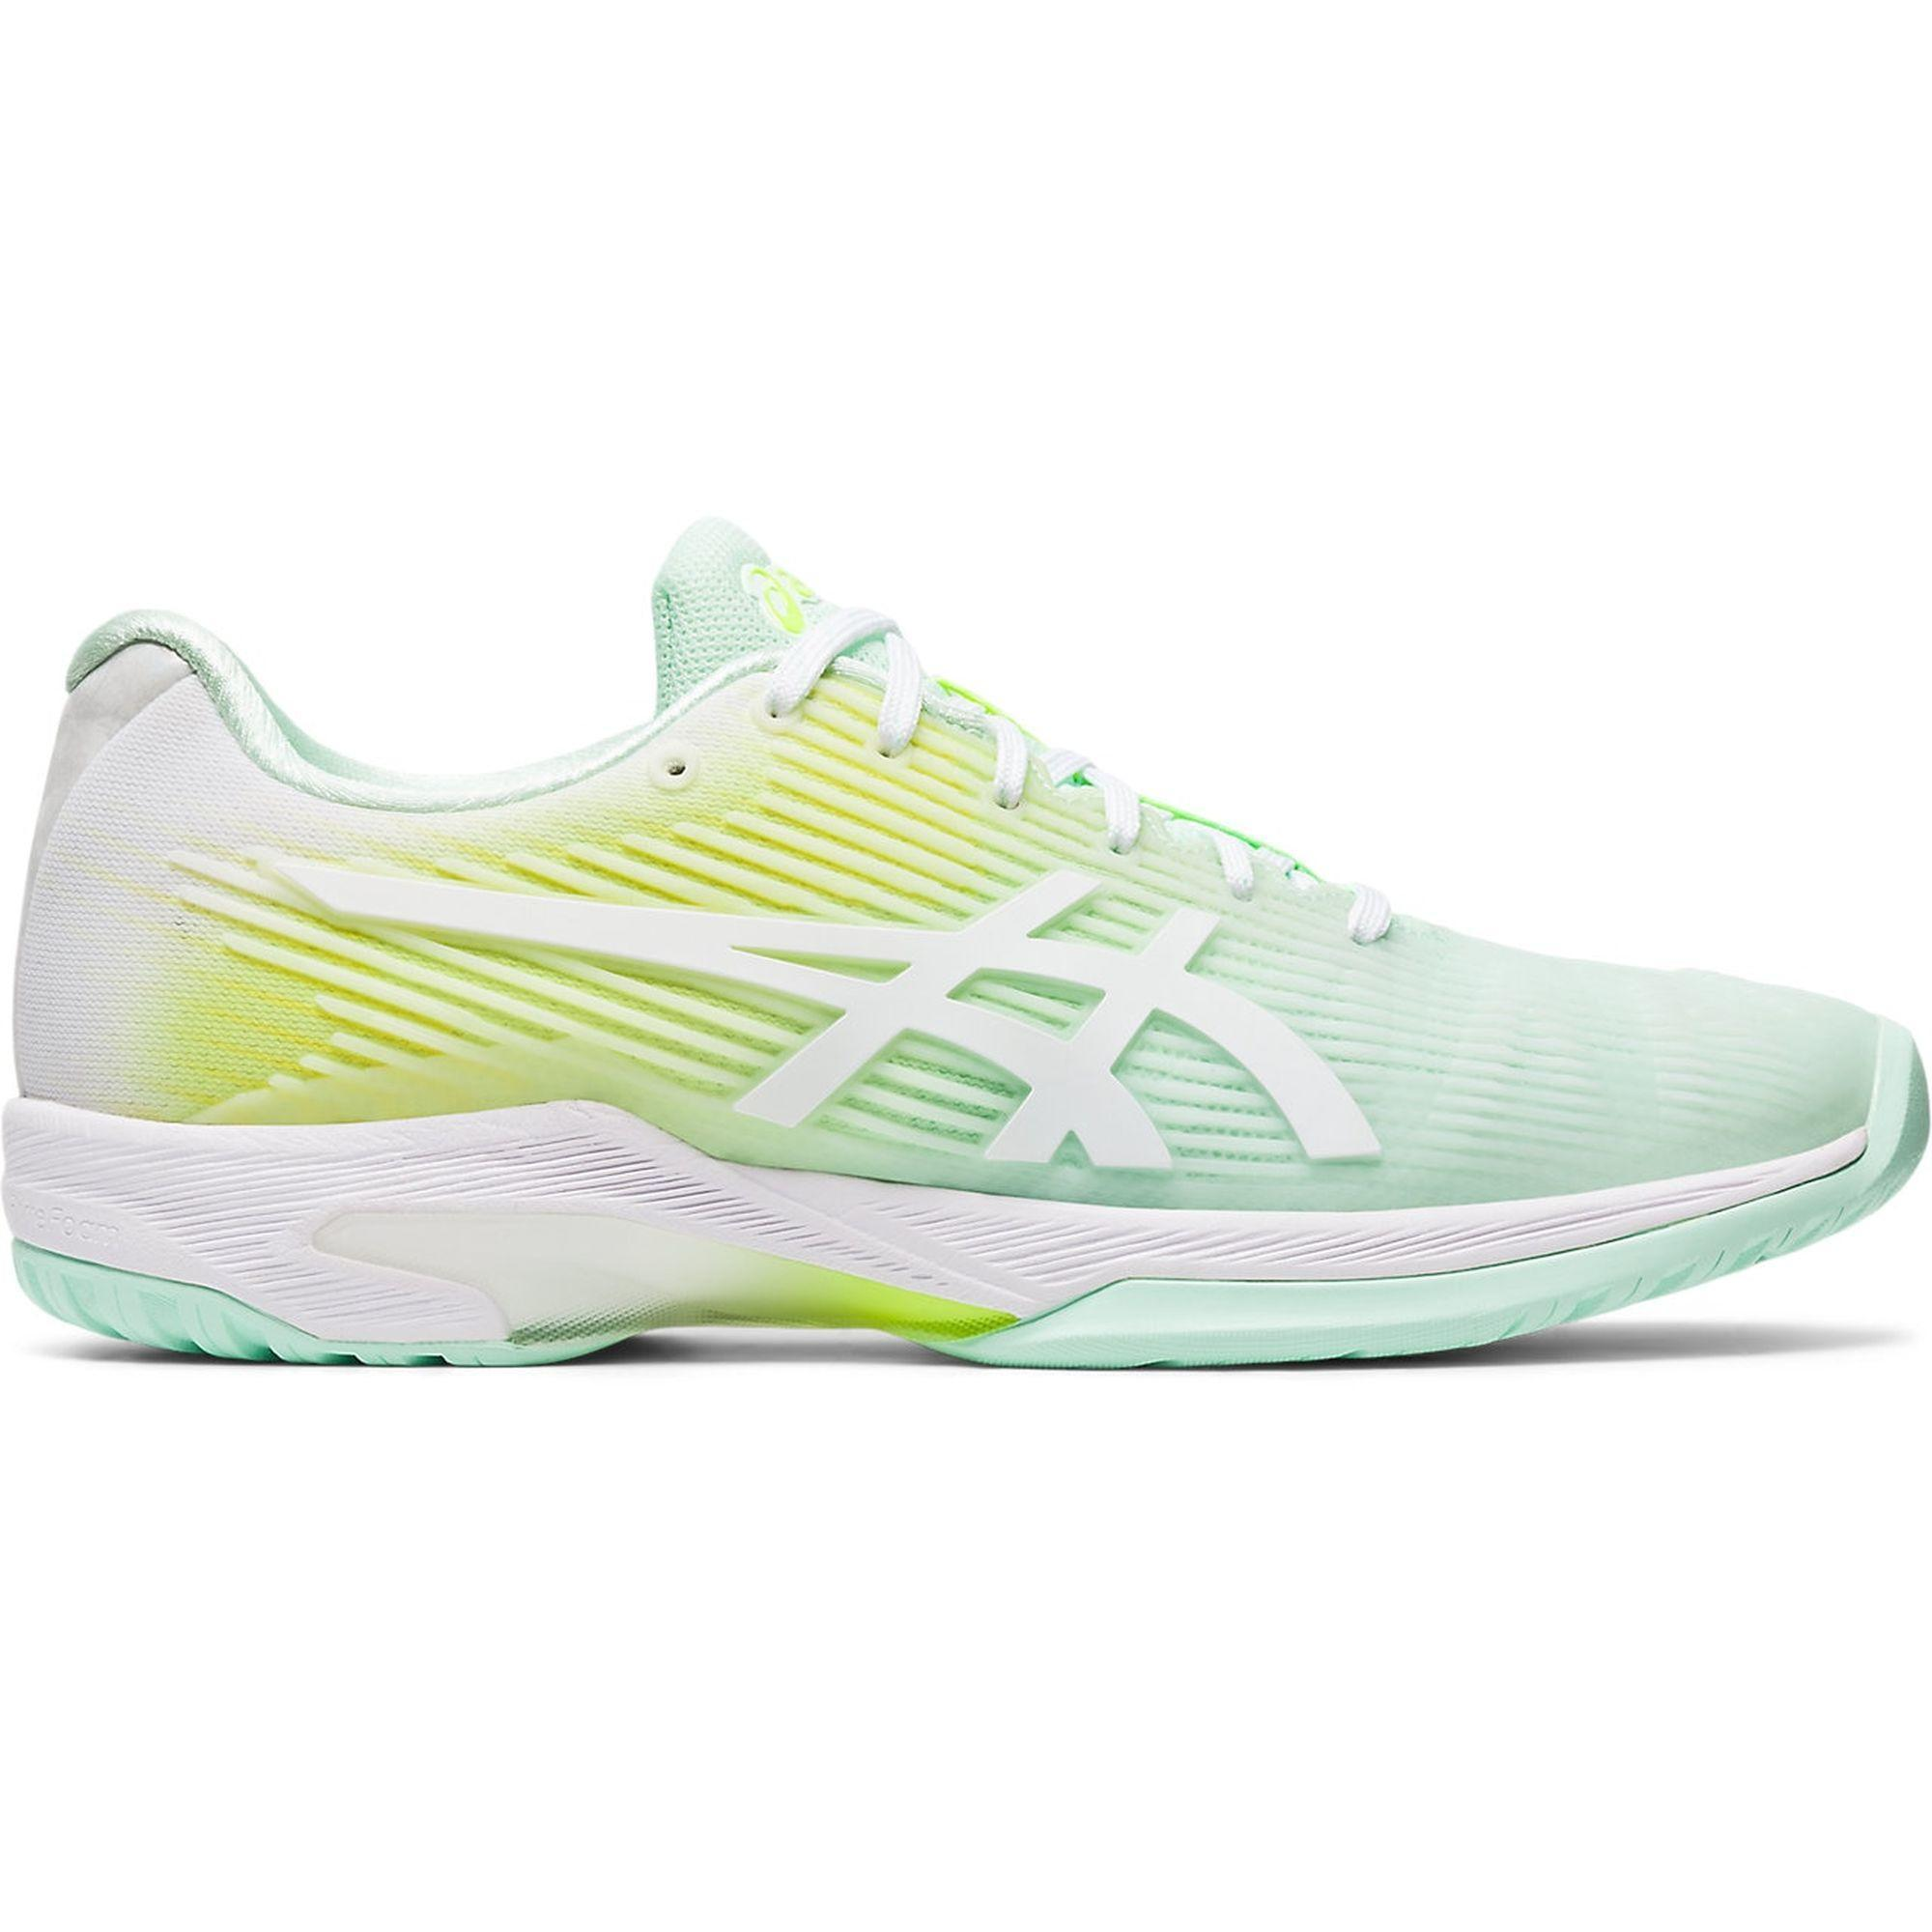 asics neo 4 walking shoes decathlon